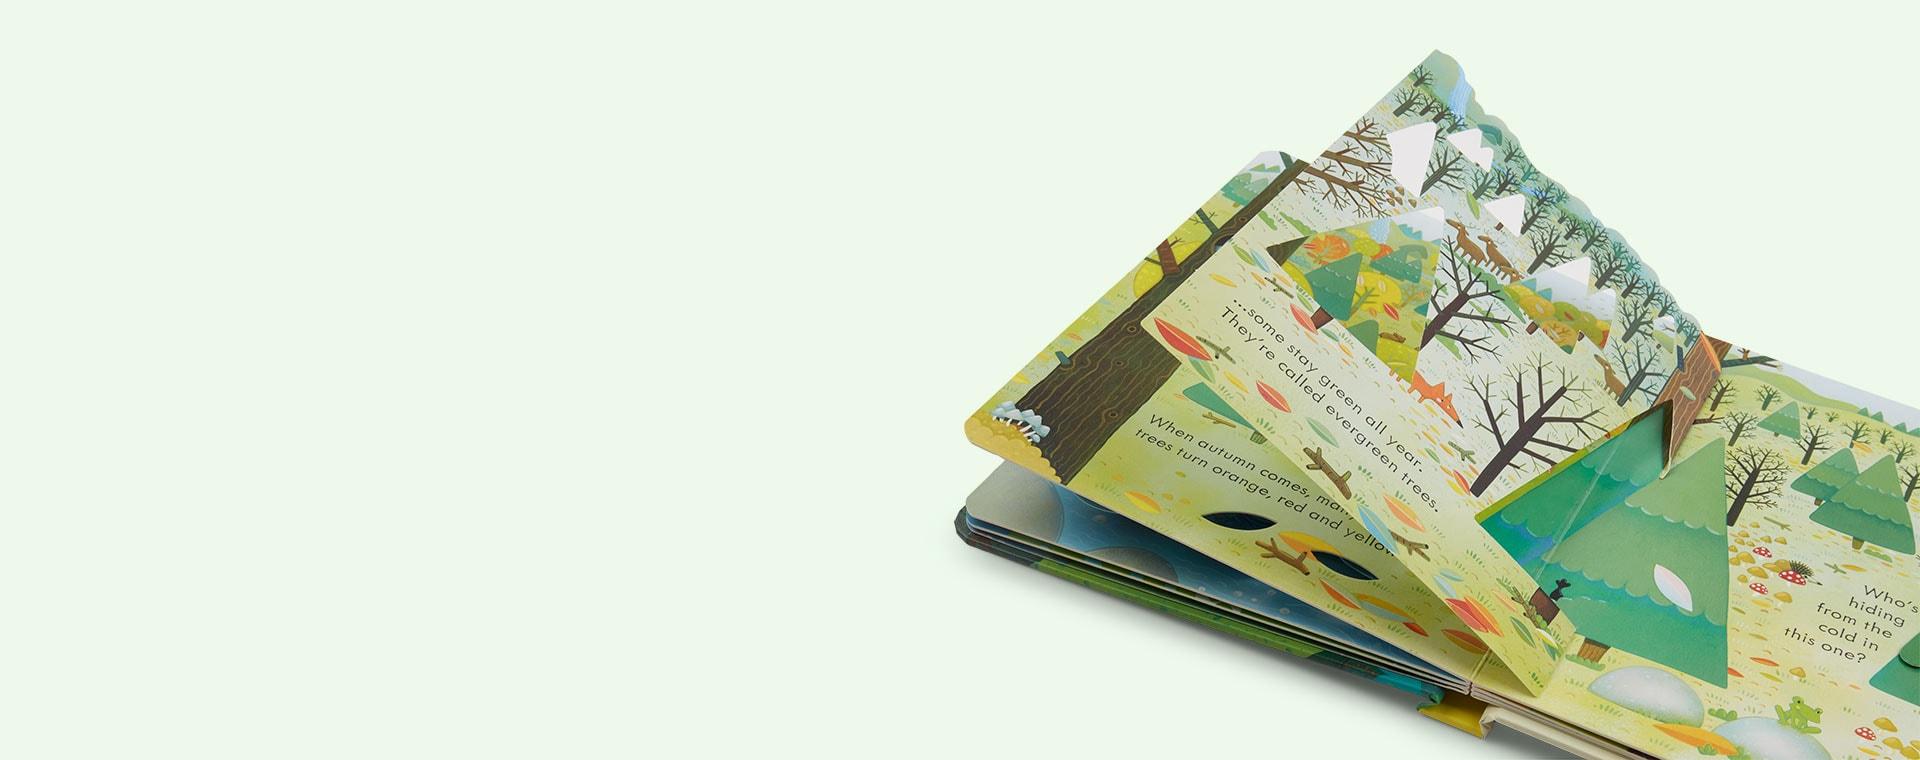 Green bookspeed Peep Inside: The Forest